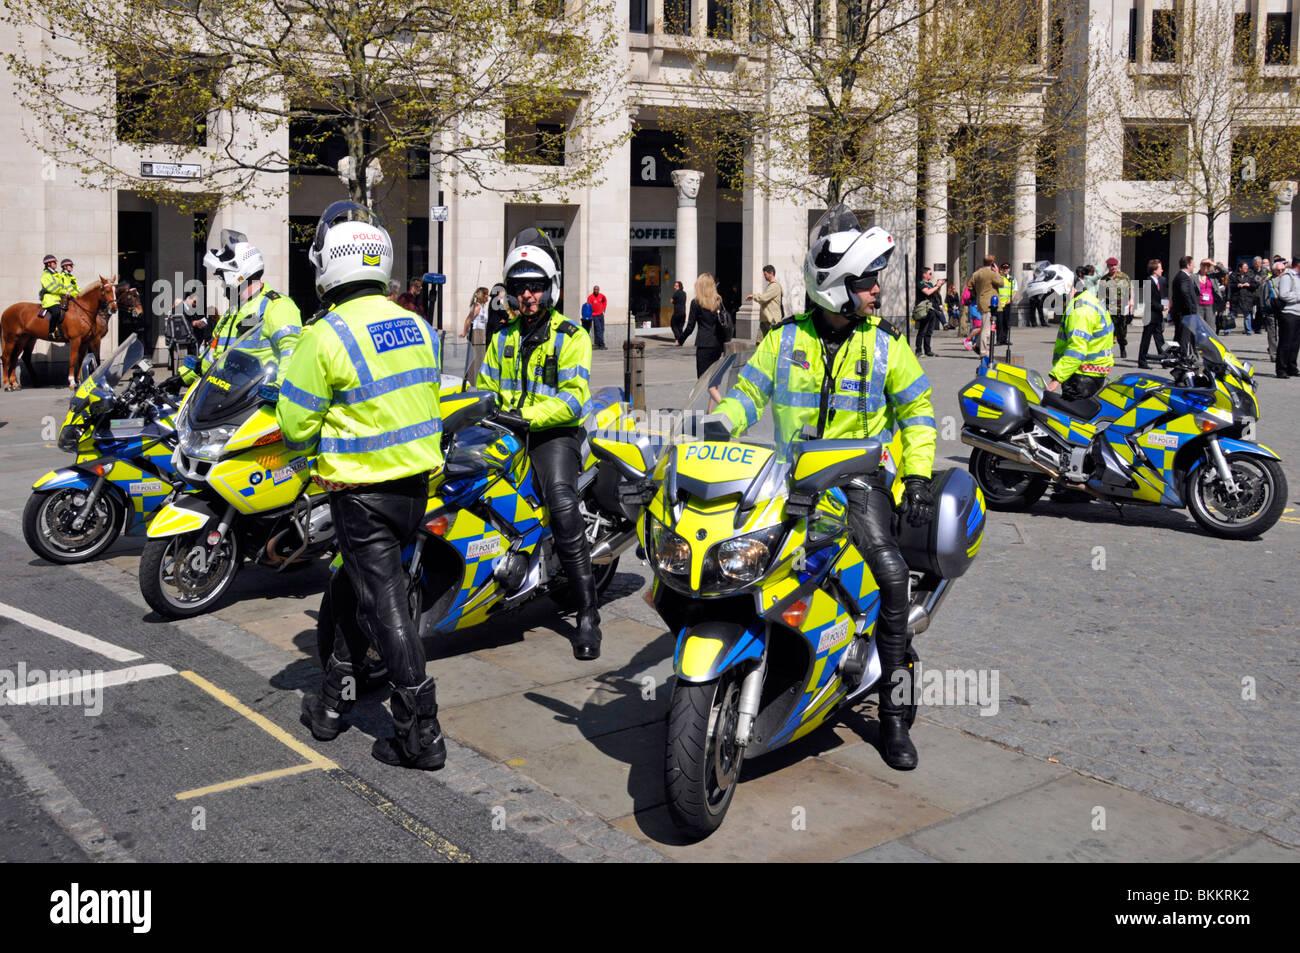 Ciudad de Londres policía motos esperando para acompañar a un desfile Imagen De Stock